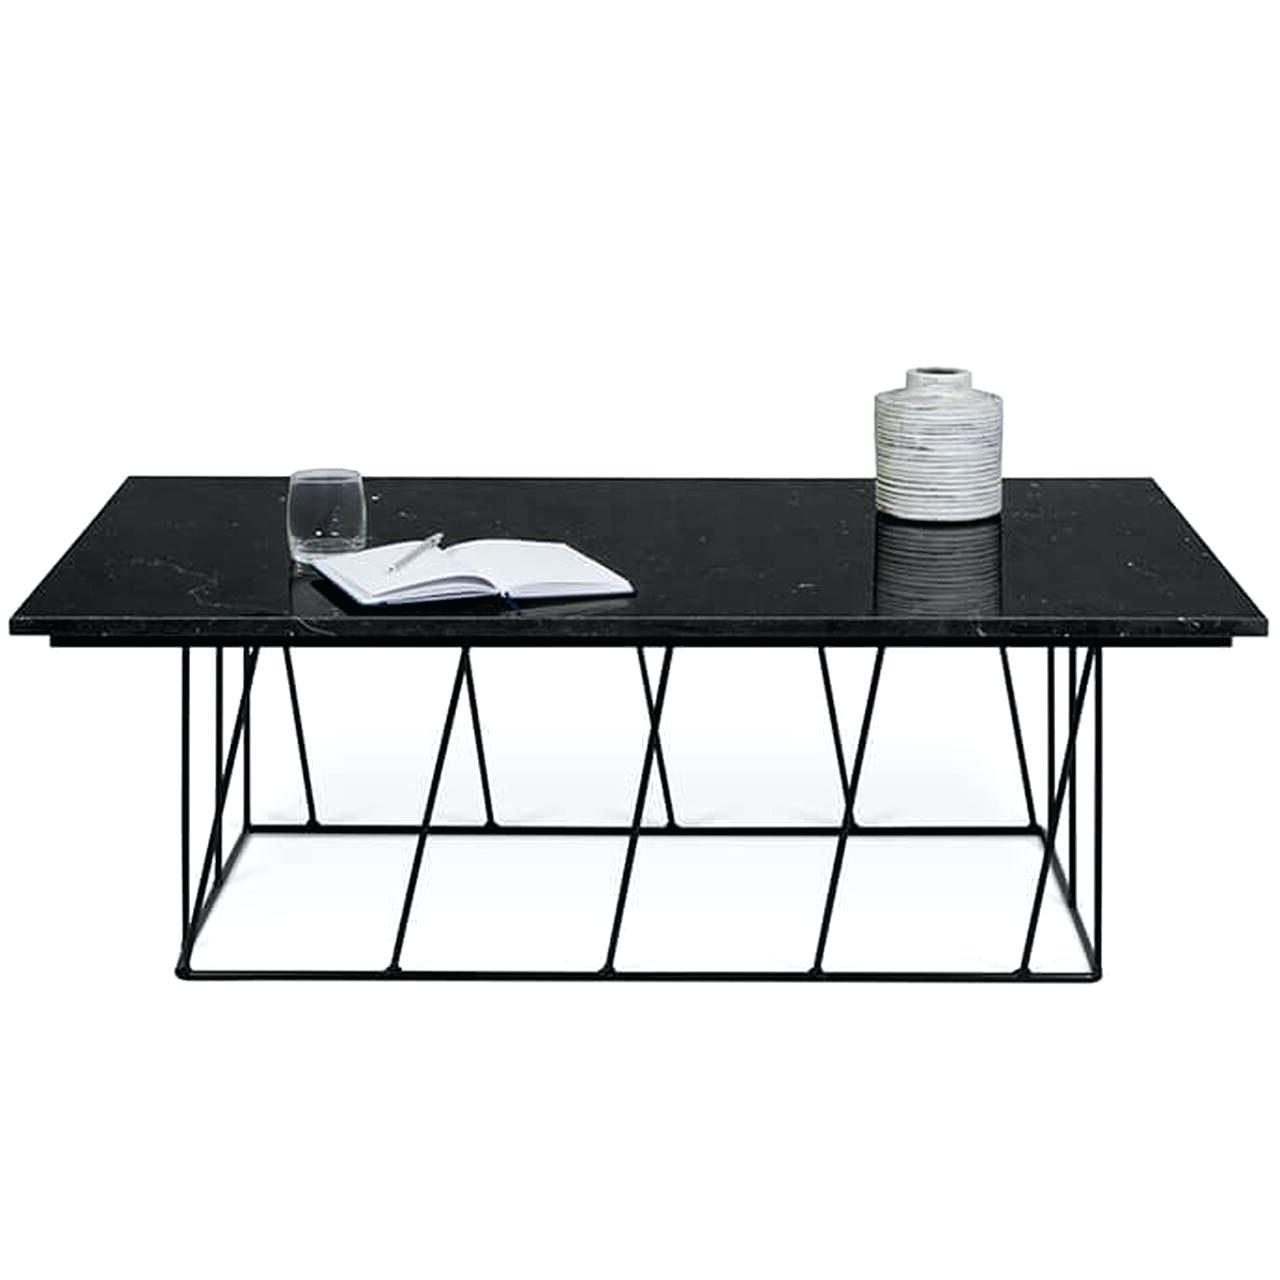 Black Contemporary Coffee Table – Masnoticias (View 16 of 20)